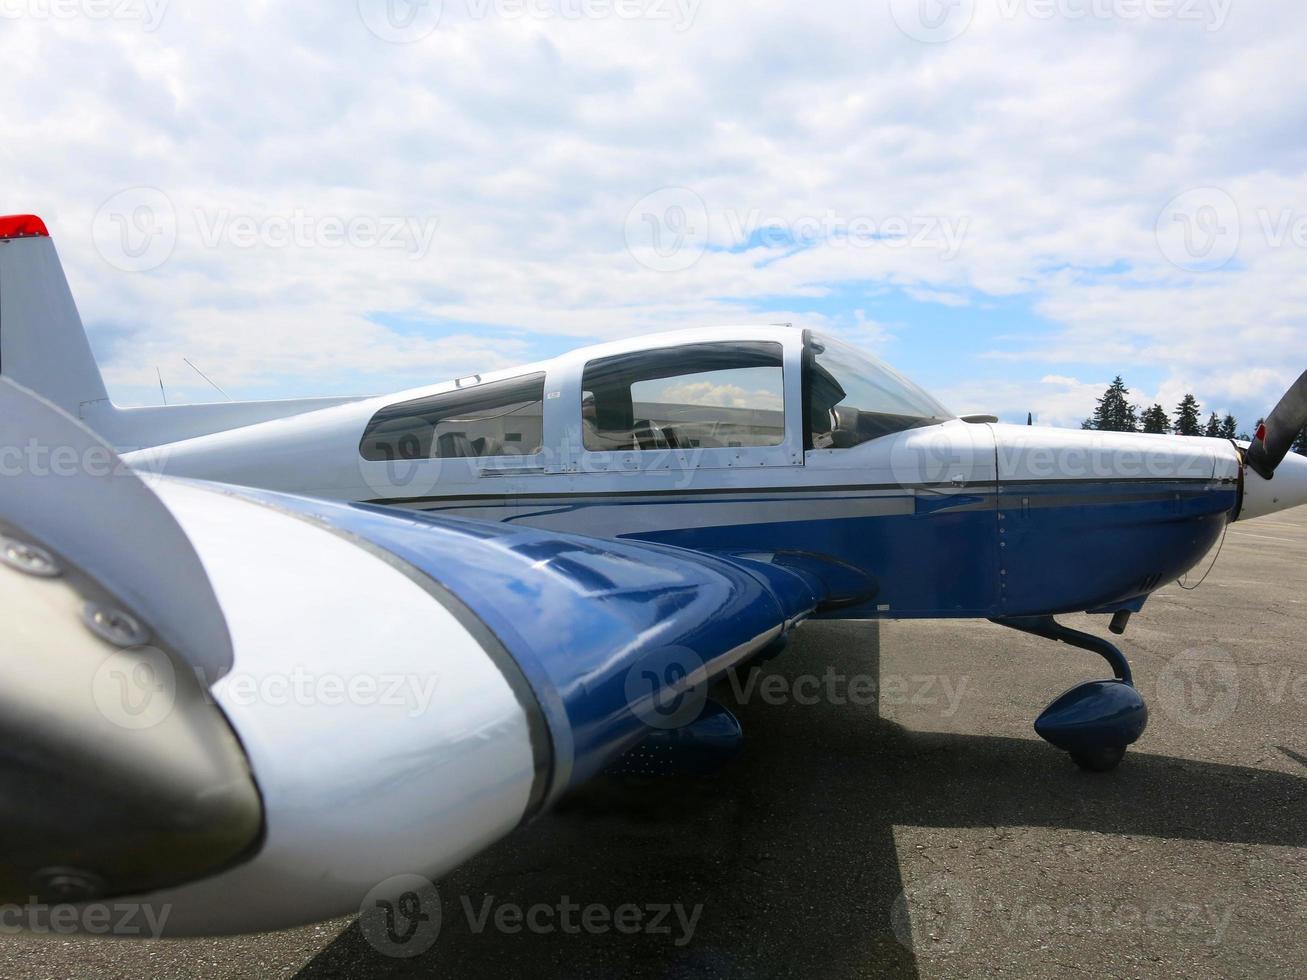 Propellerflugzeug foto